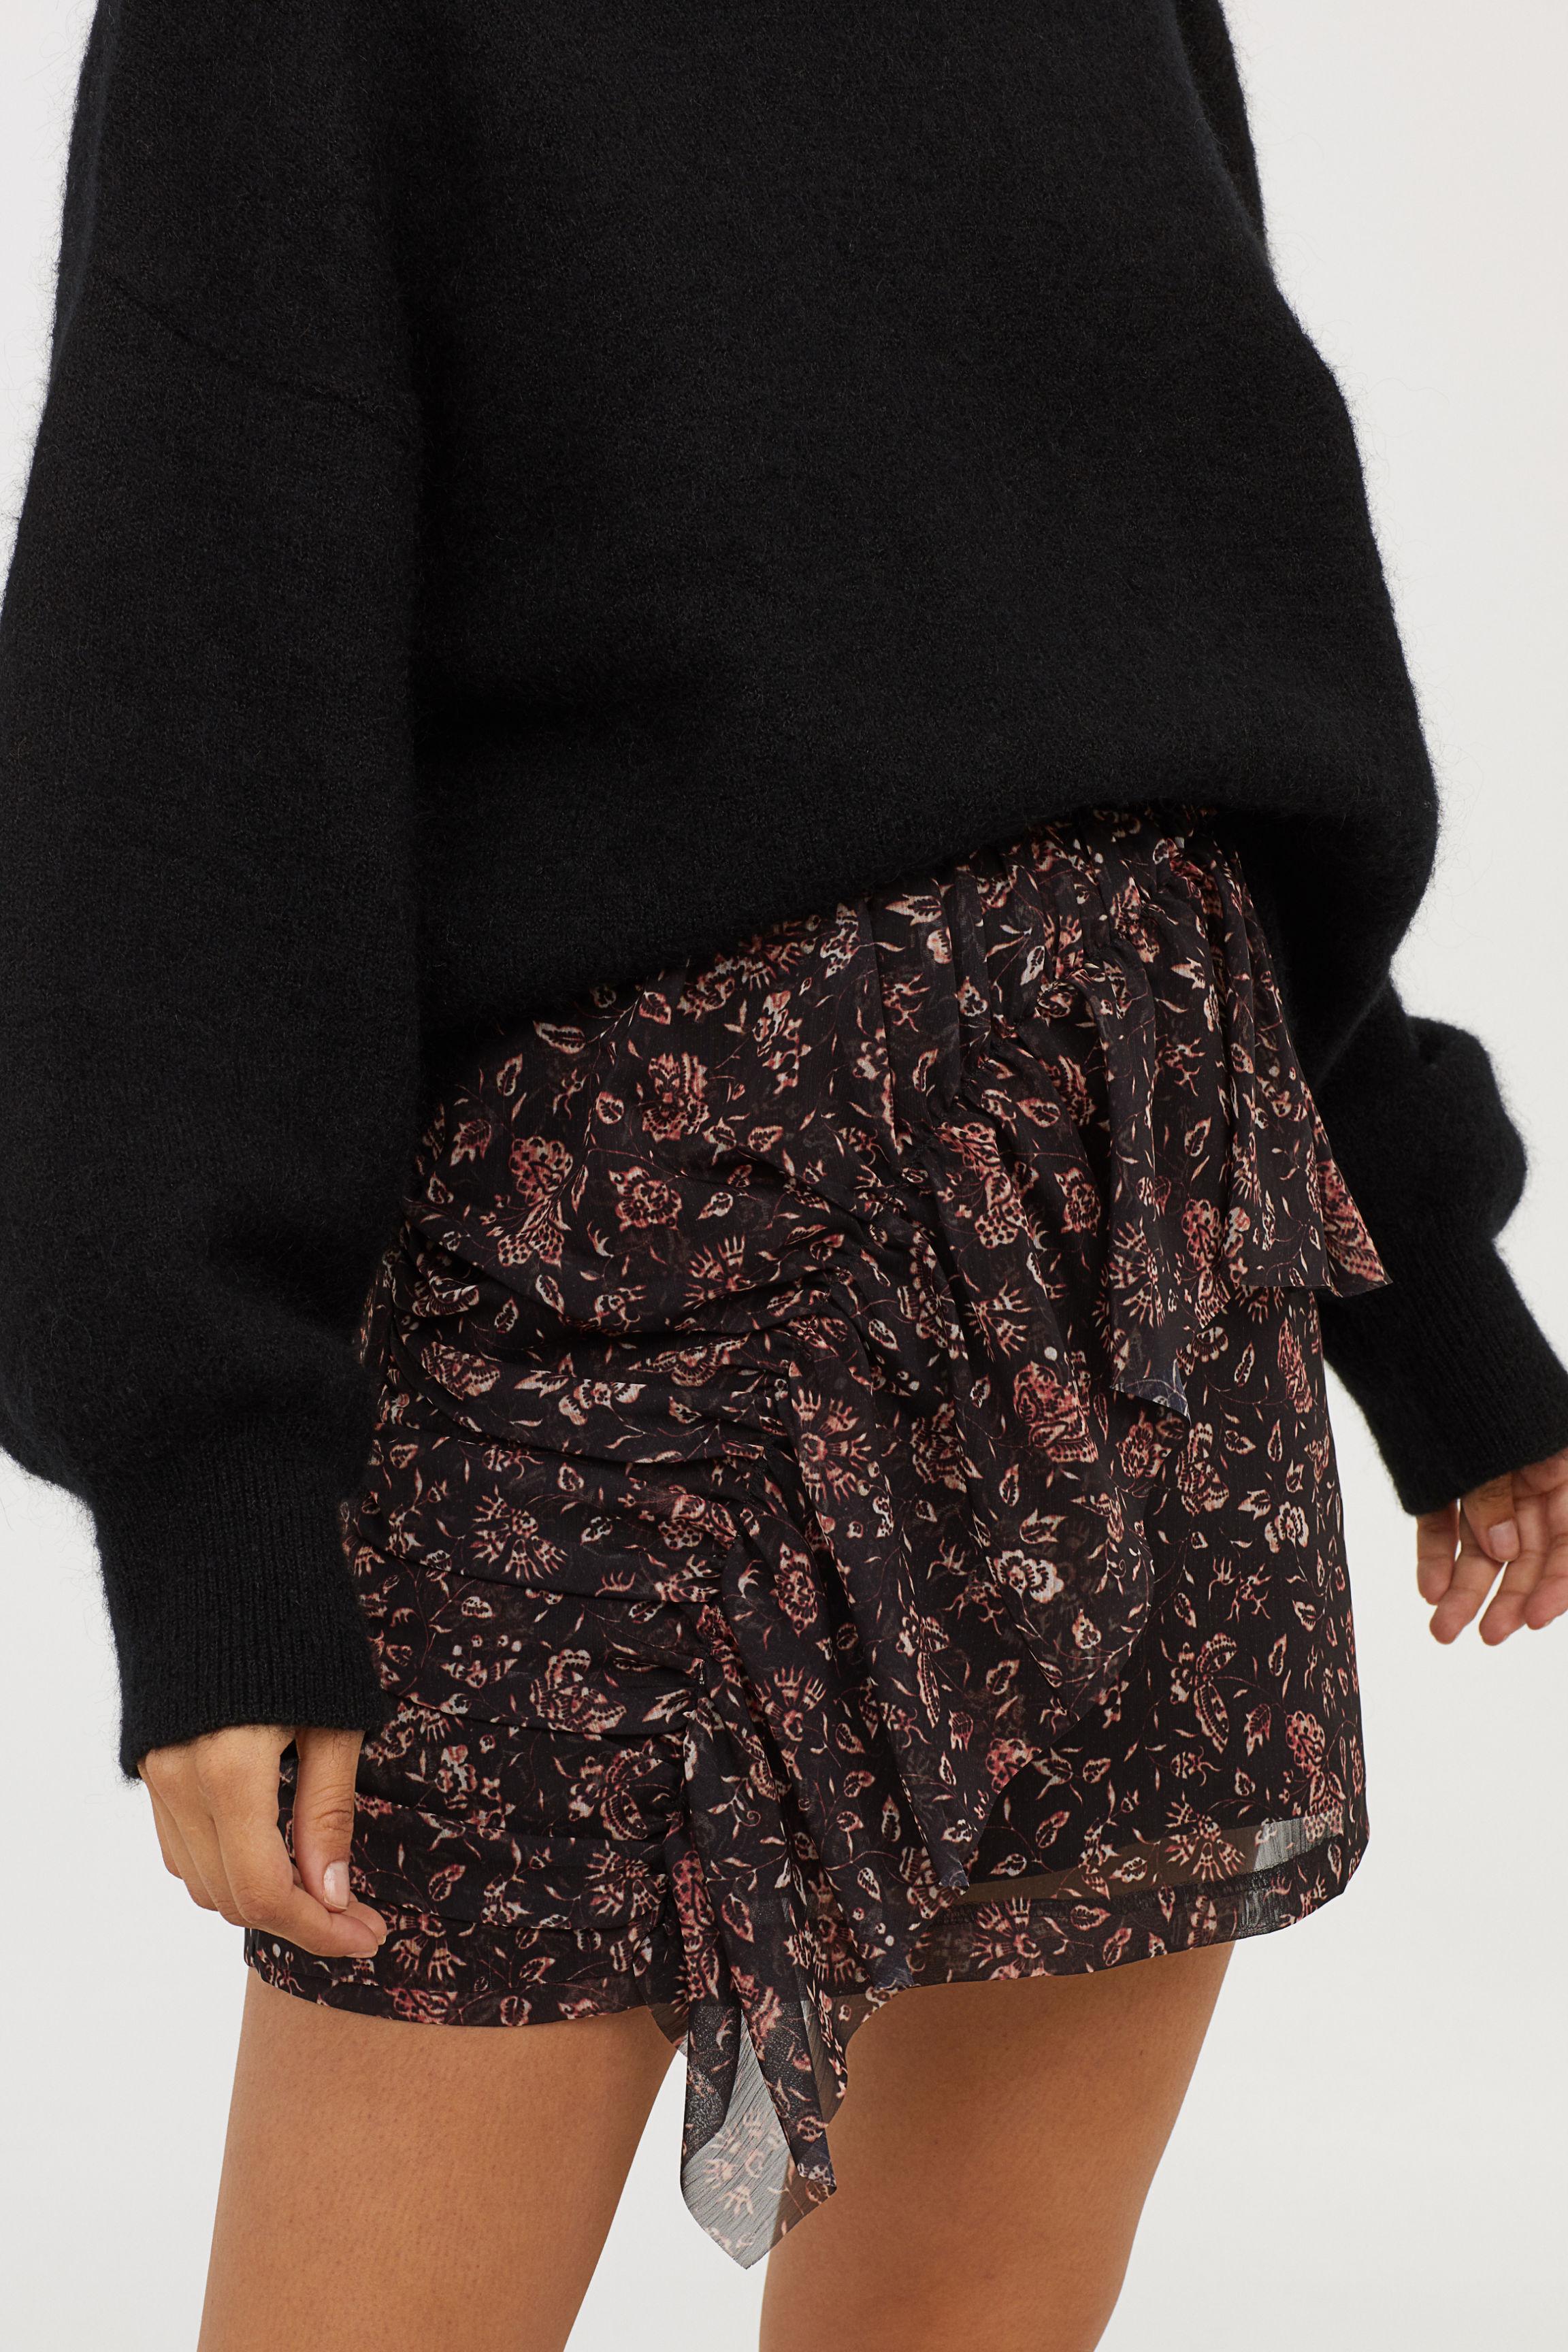 Draped Skirt - Black/patterned - Ladies | H&M US